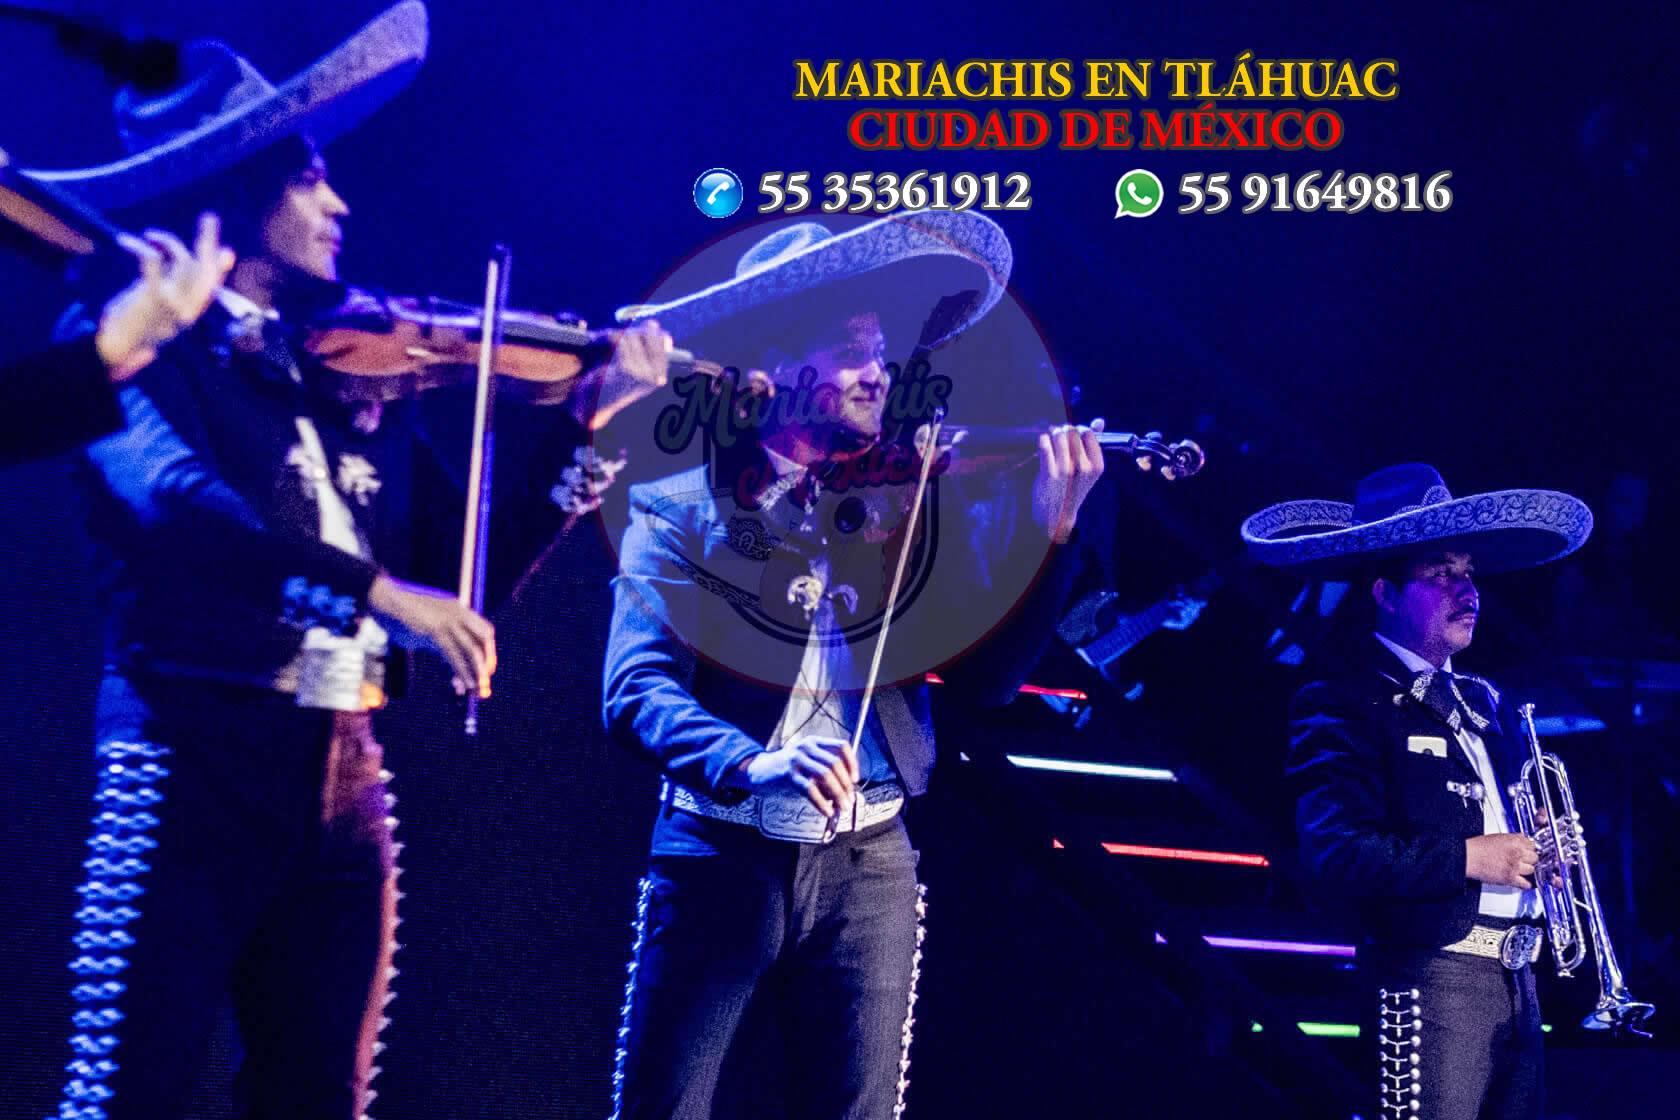 Mariachis en Tláhuac